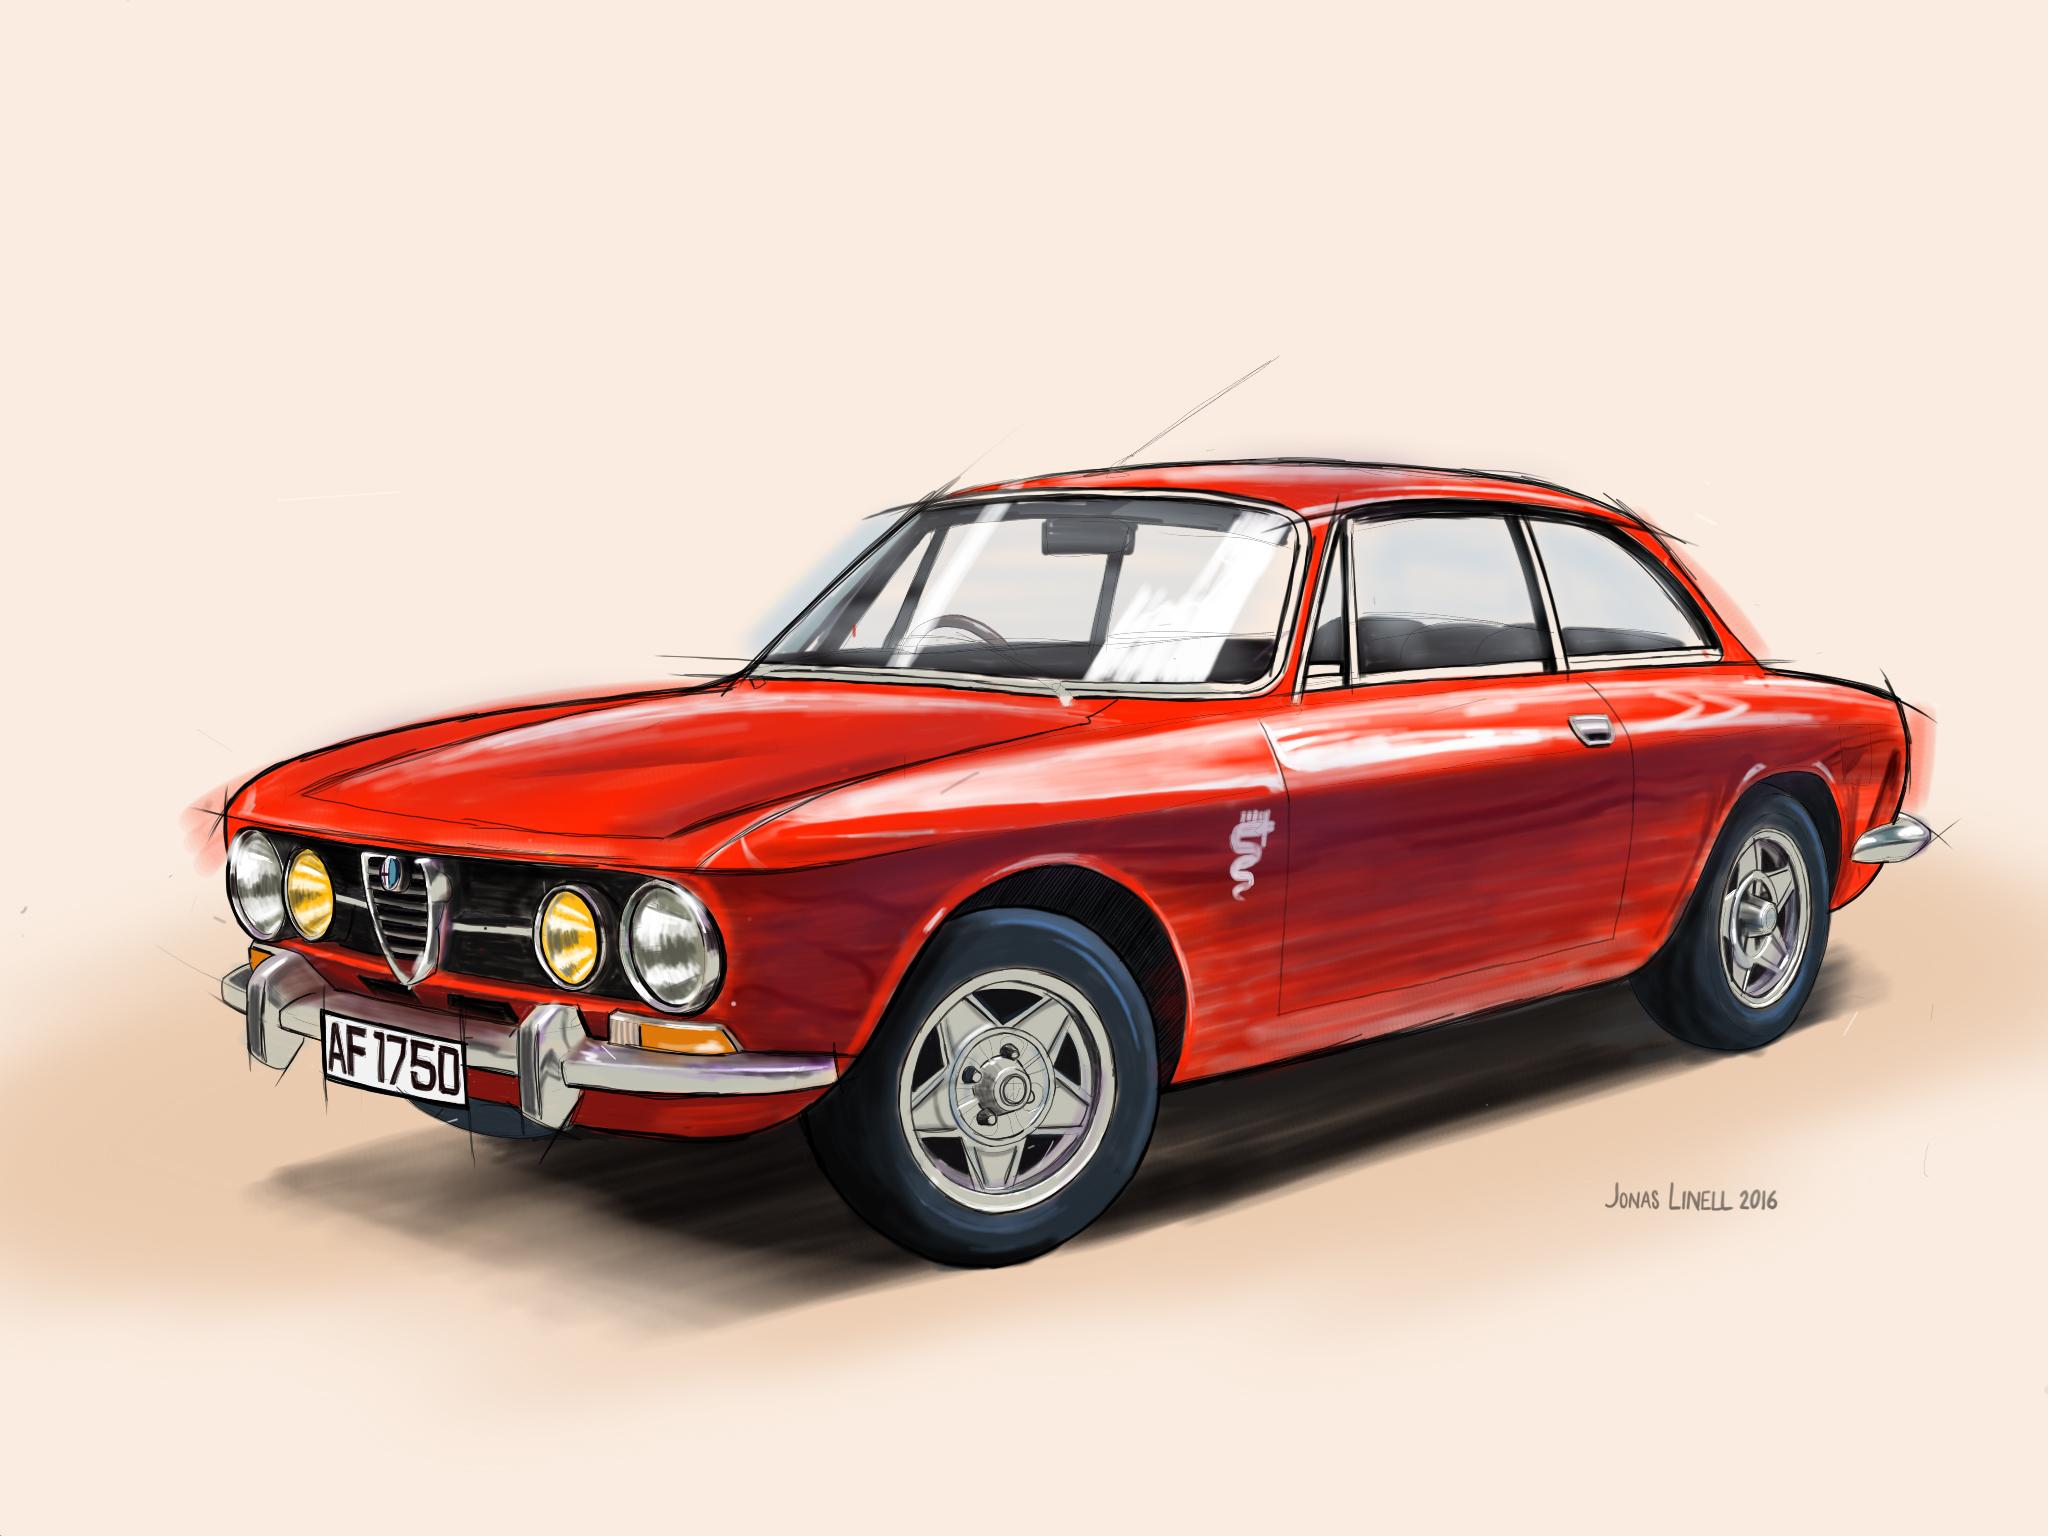 Alfa Romeo GTV 1750 Bertone. Diigtal painting by Jonas Linell 2016